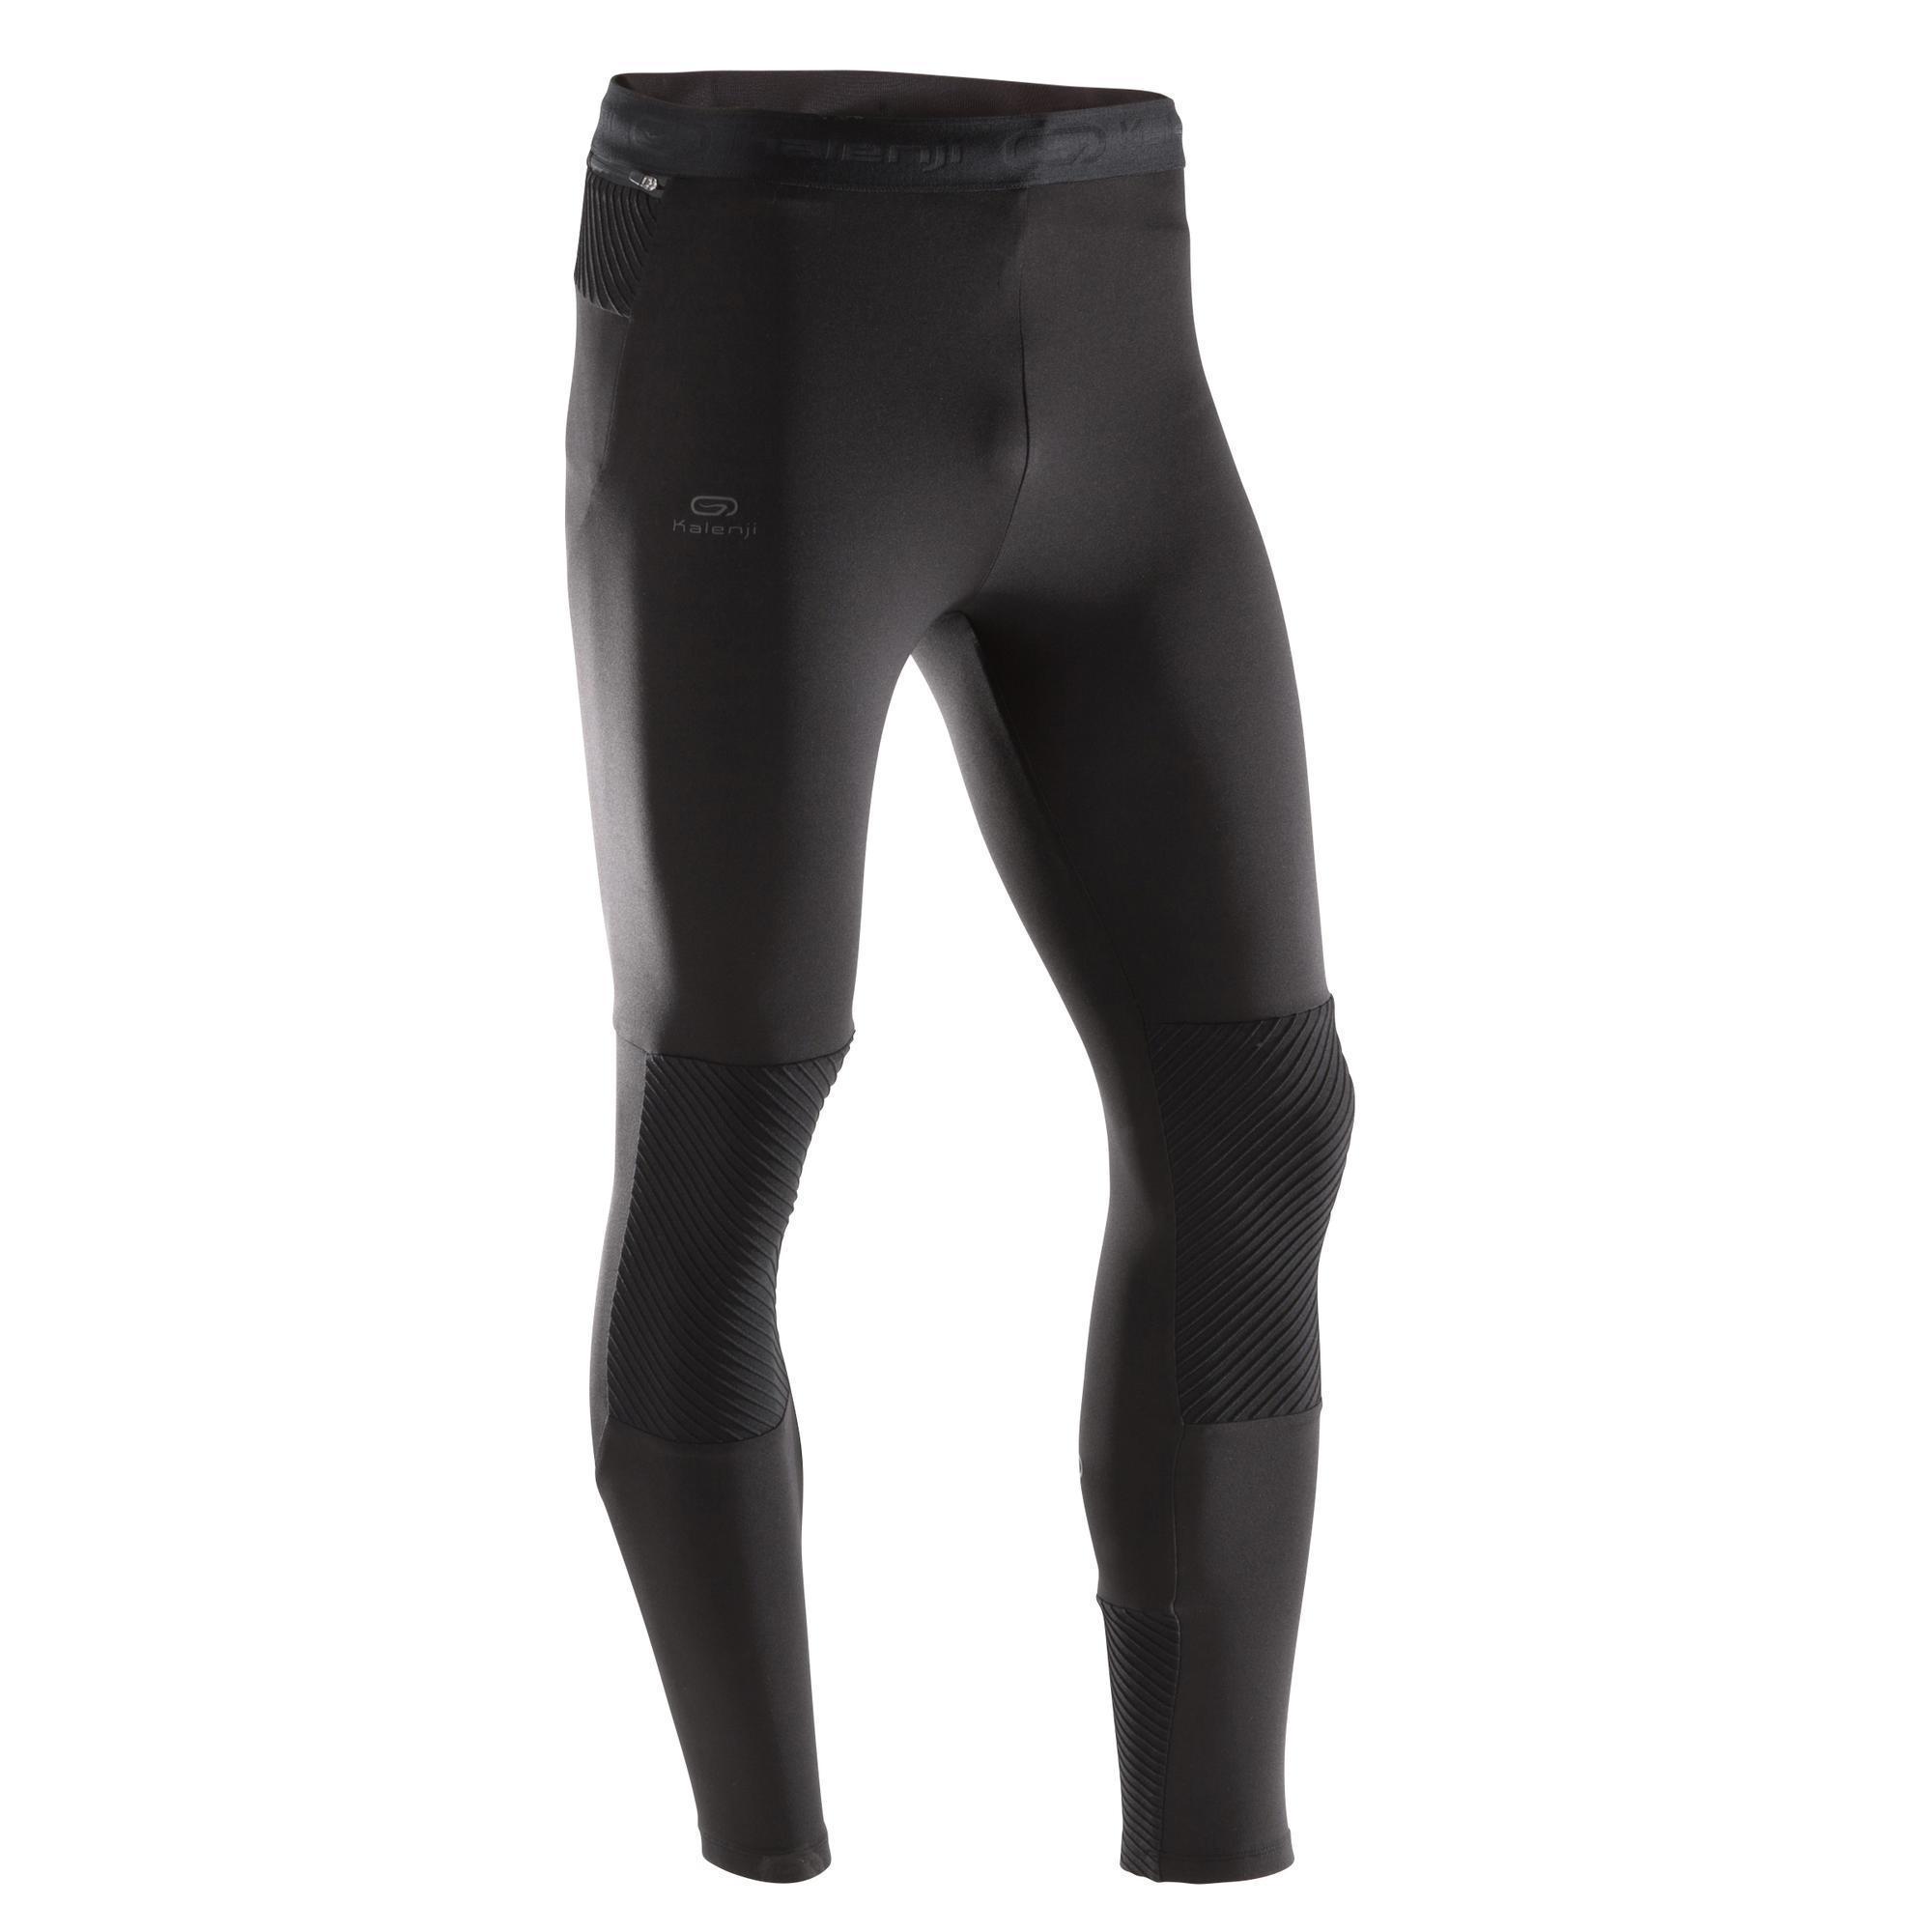 Laufhose lang Tights Run Warm+ Herren | Sportbekleidung > Sporthosen > Laufhosen | Kalenji